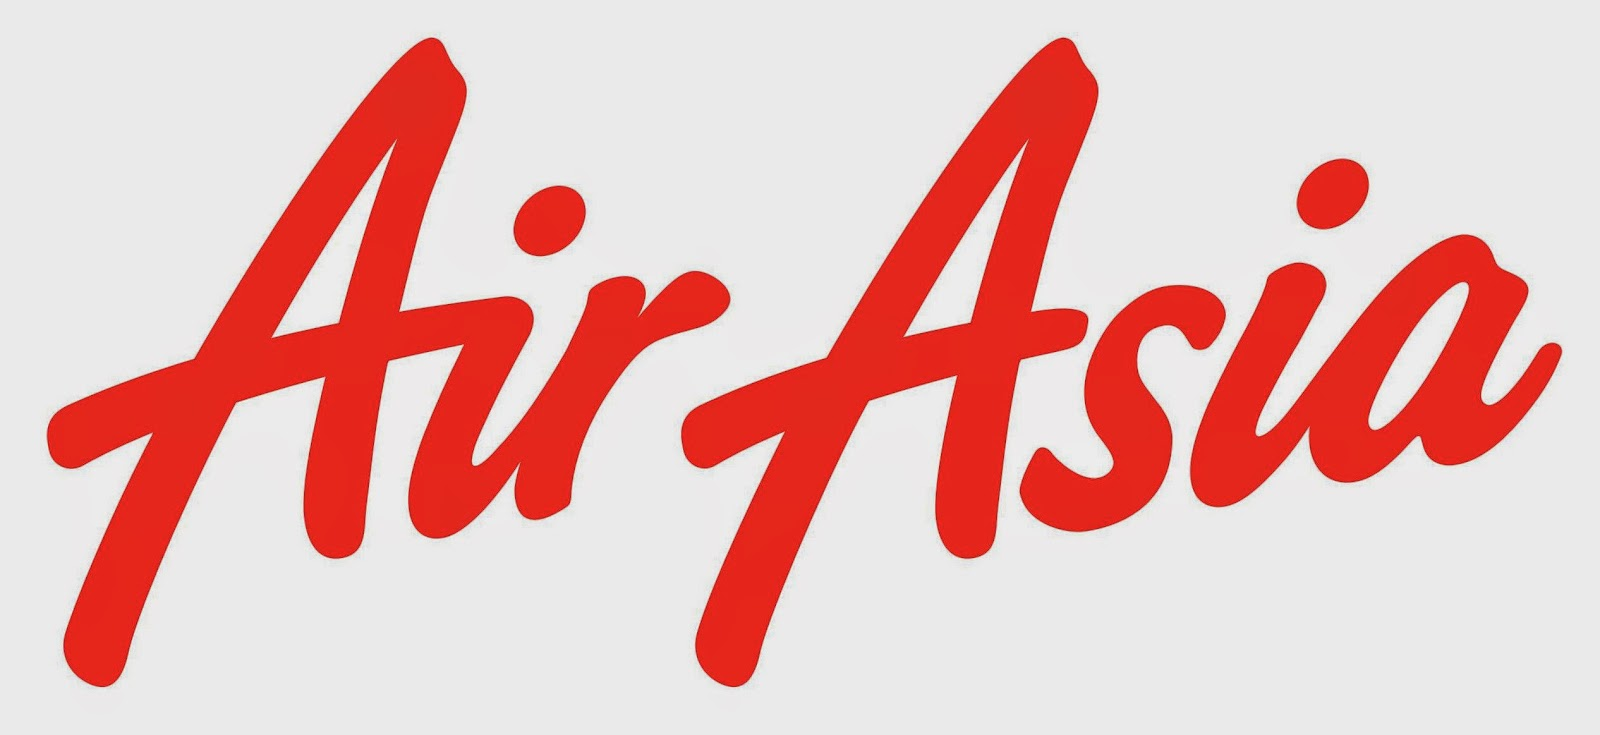 swot air asia ตัวอย่างของการวิเคราะห์ swot สายการบิน airasia strengths (จุดแข็ง) 1.